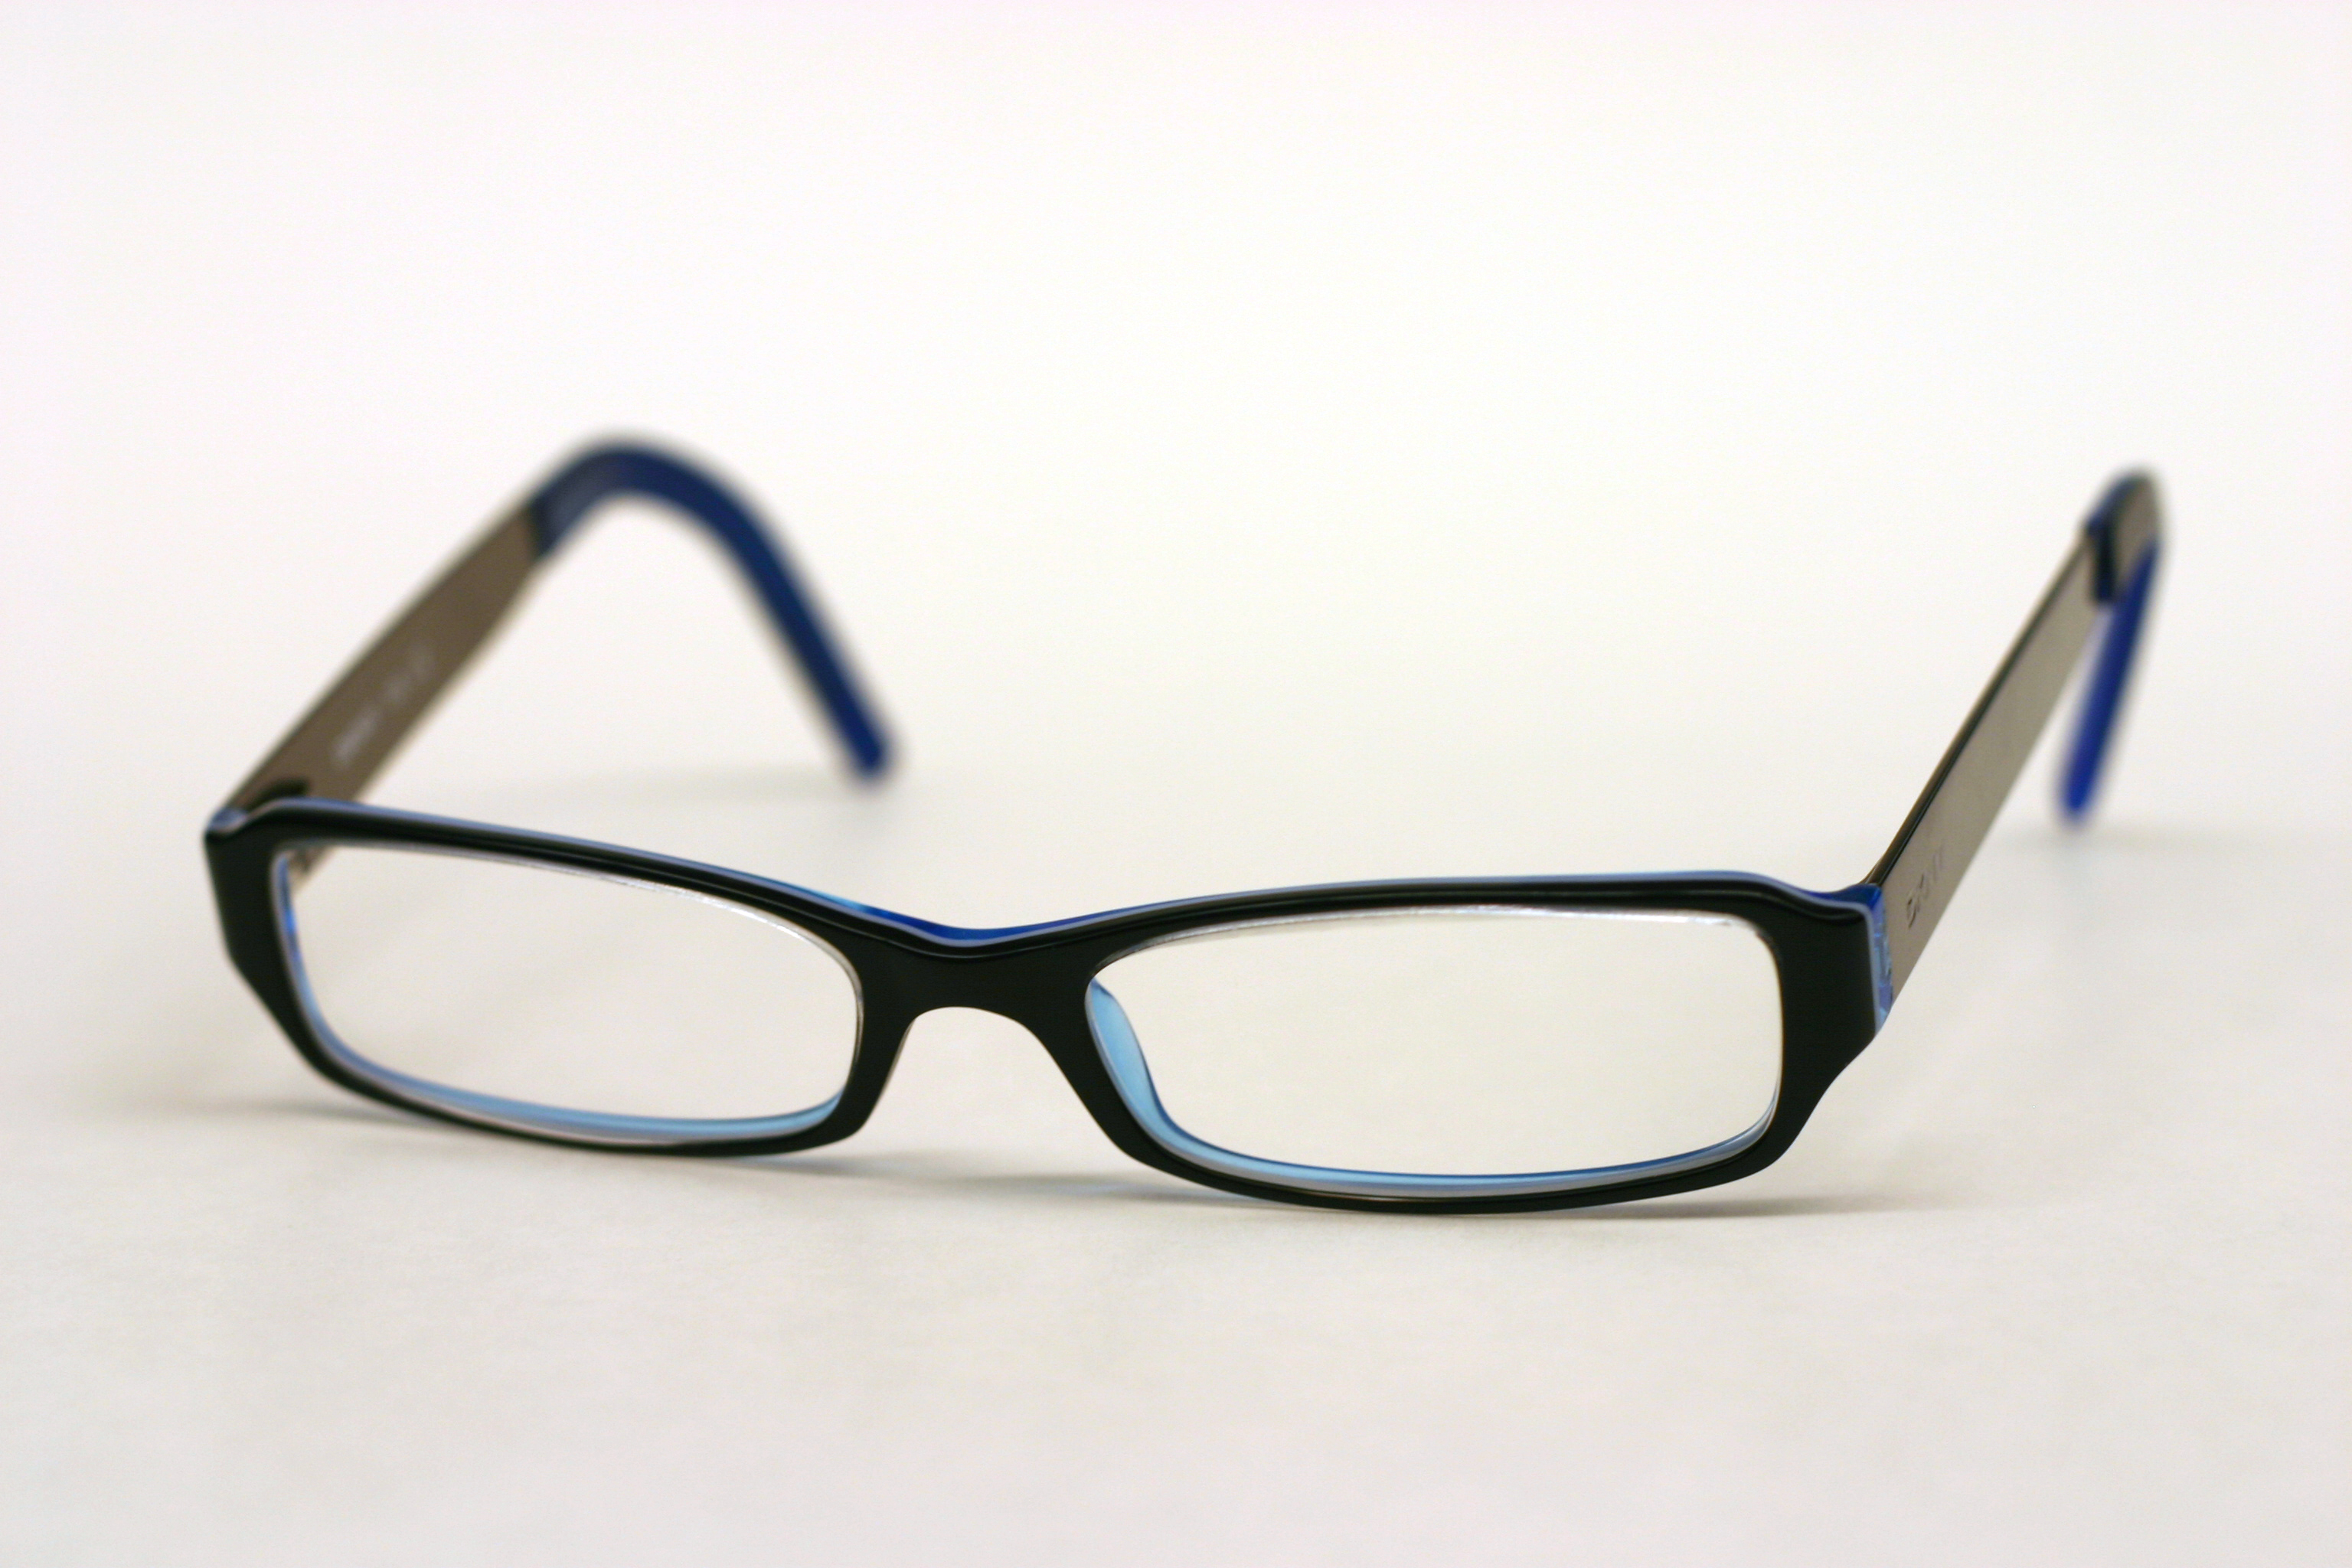 Eyeglasses Collection Program Results